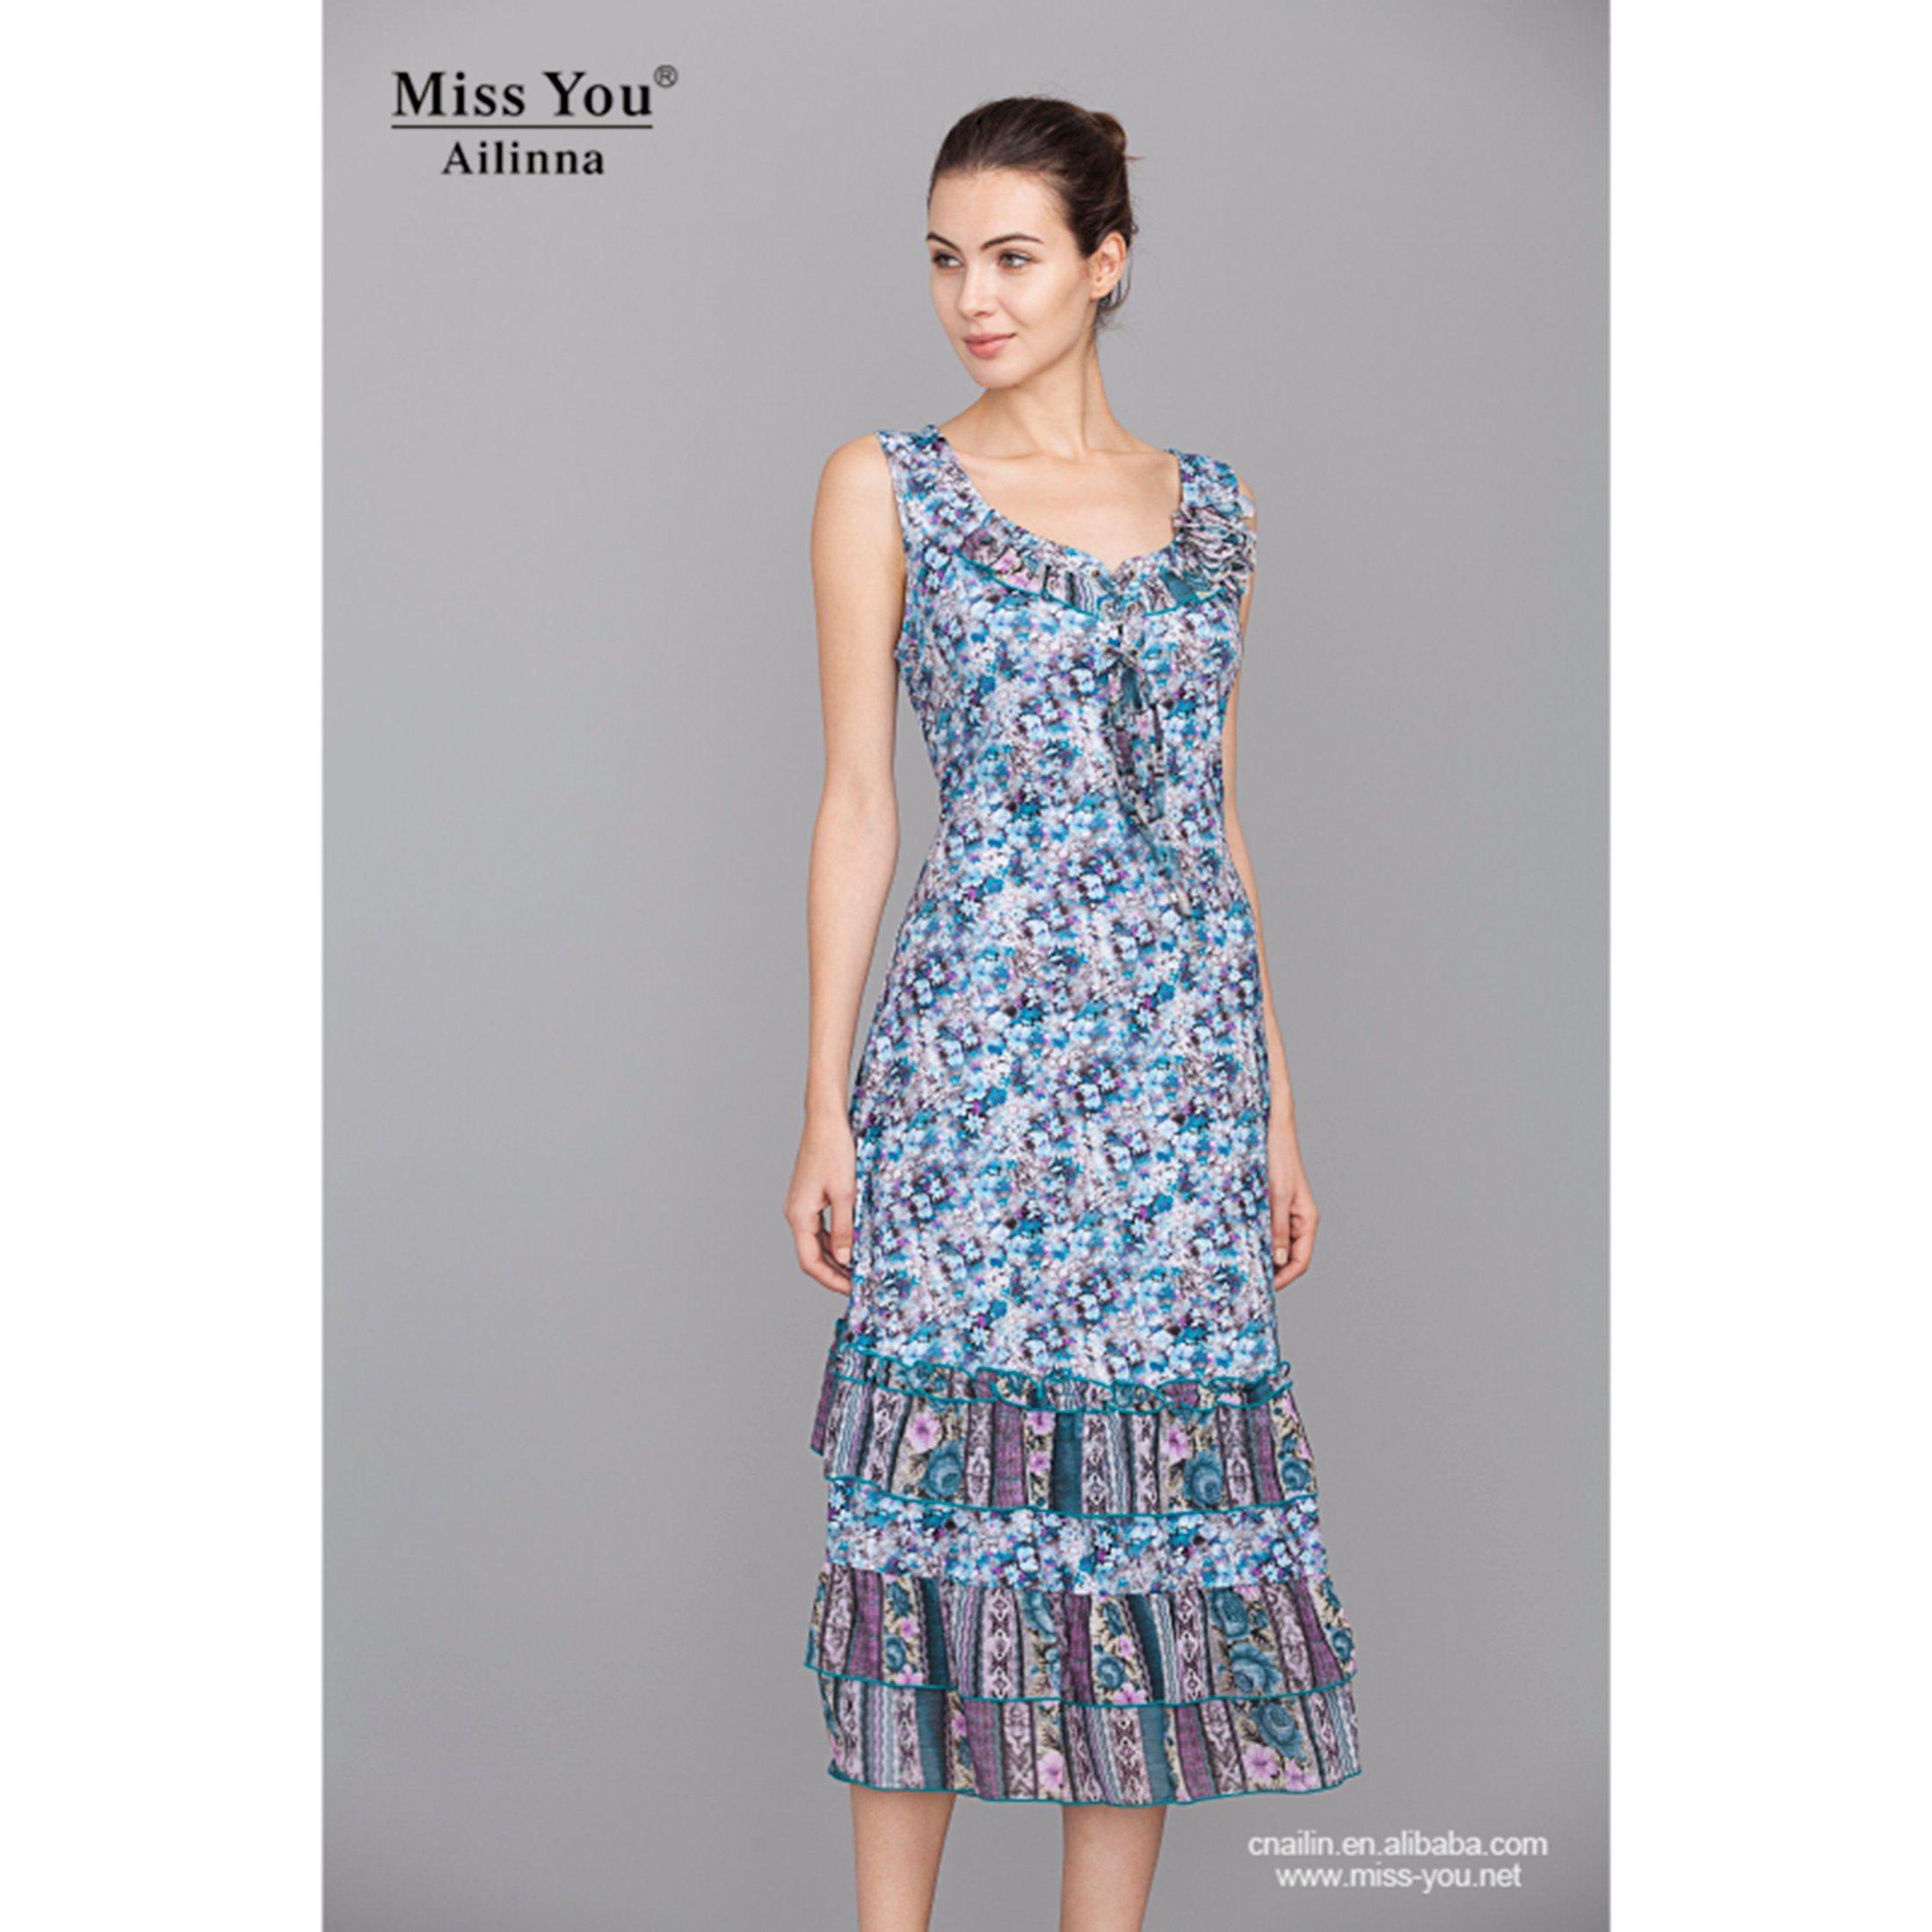 Miss You Ailinna 100938-1 Dress Distributor Blue Floral Slip Dress New Design Beach Dress